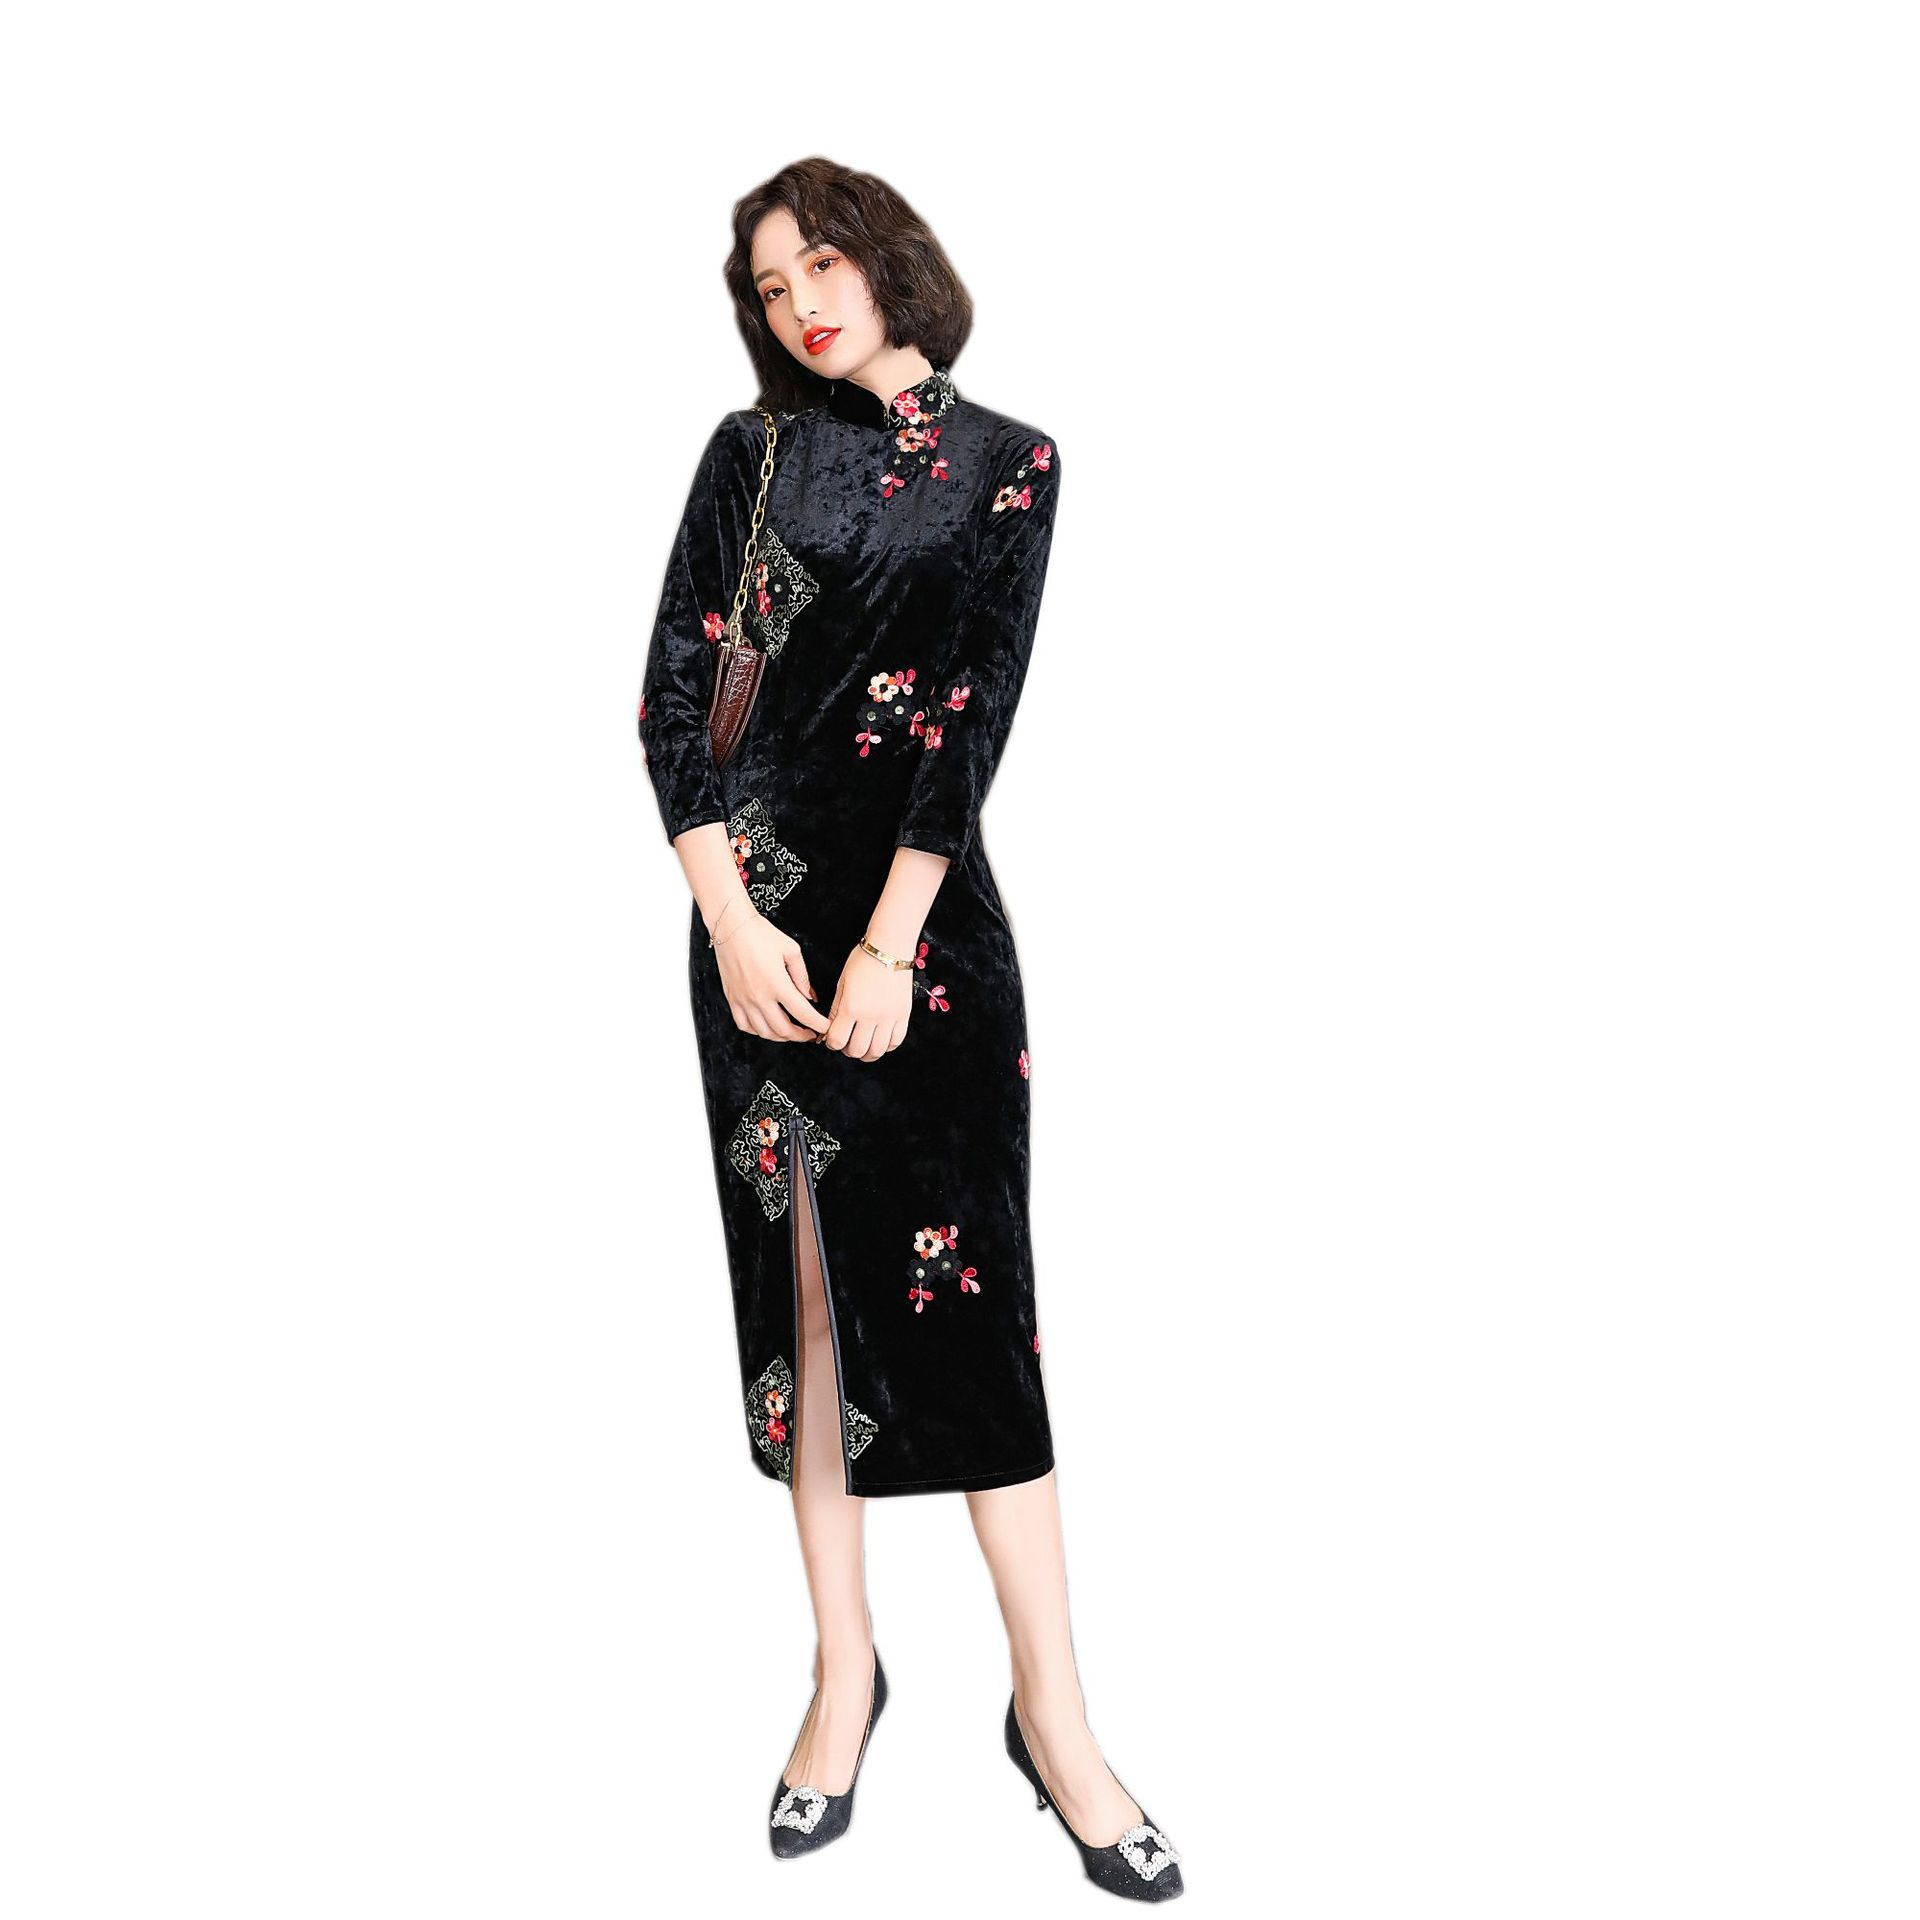 2020 Chinese Dress Qipao Dress Chinese Dresses Traditional Print Cheongsam Modern Qipao Dress Female Cotton Qipao Dress